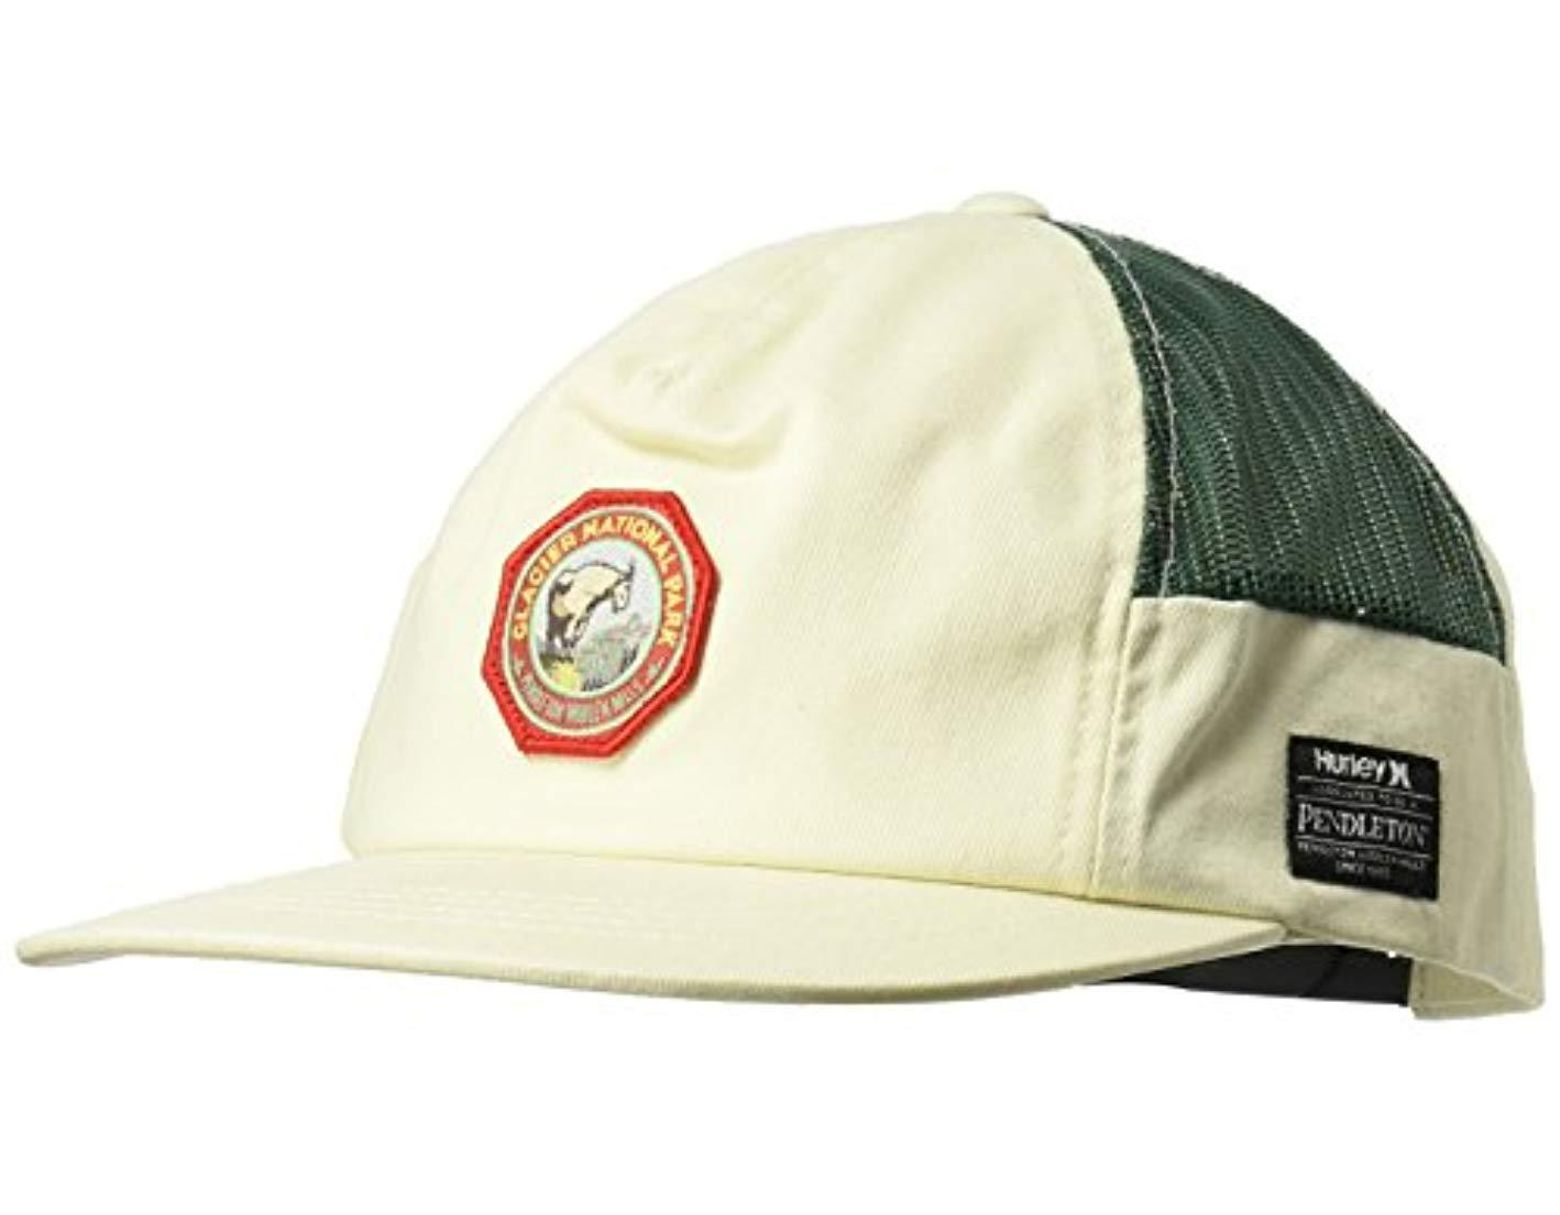 4c6d5a943558e Hurley Pendleton National Park Collection Cap for Men - Save 19% - Lyst